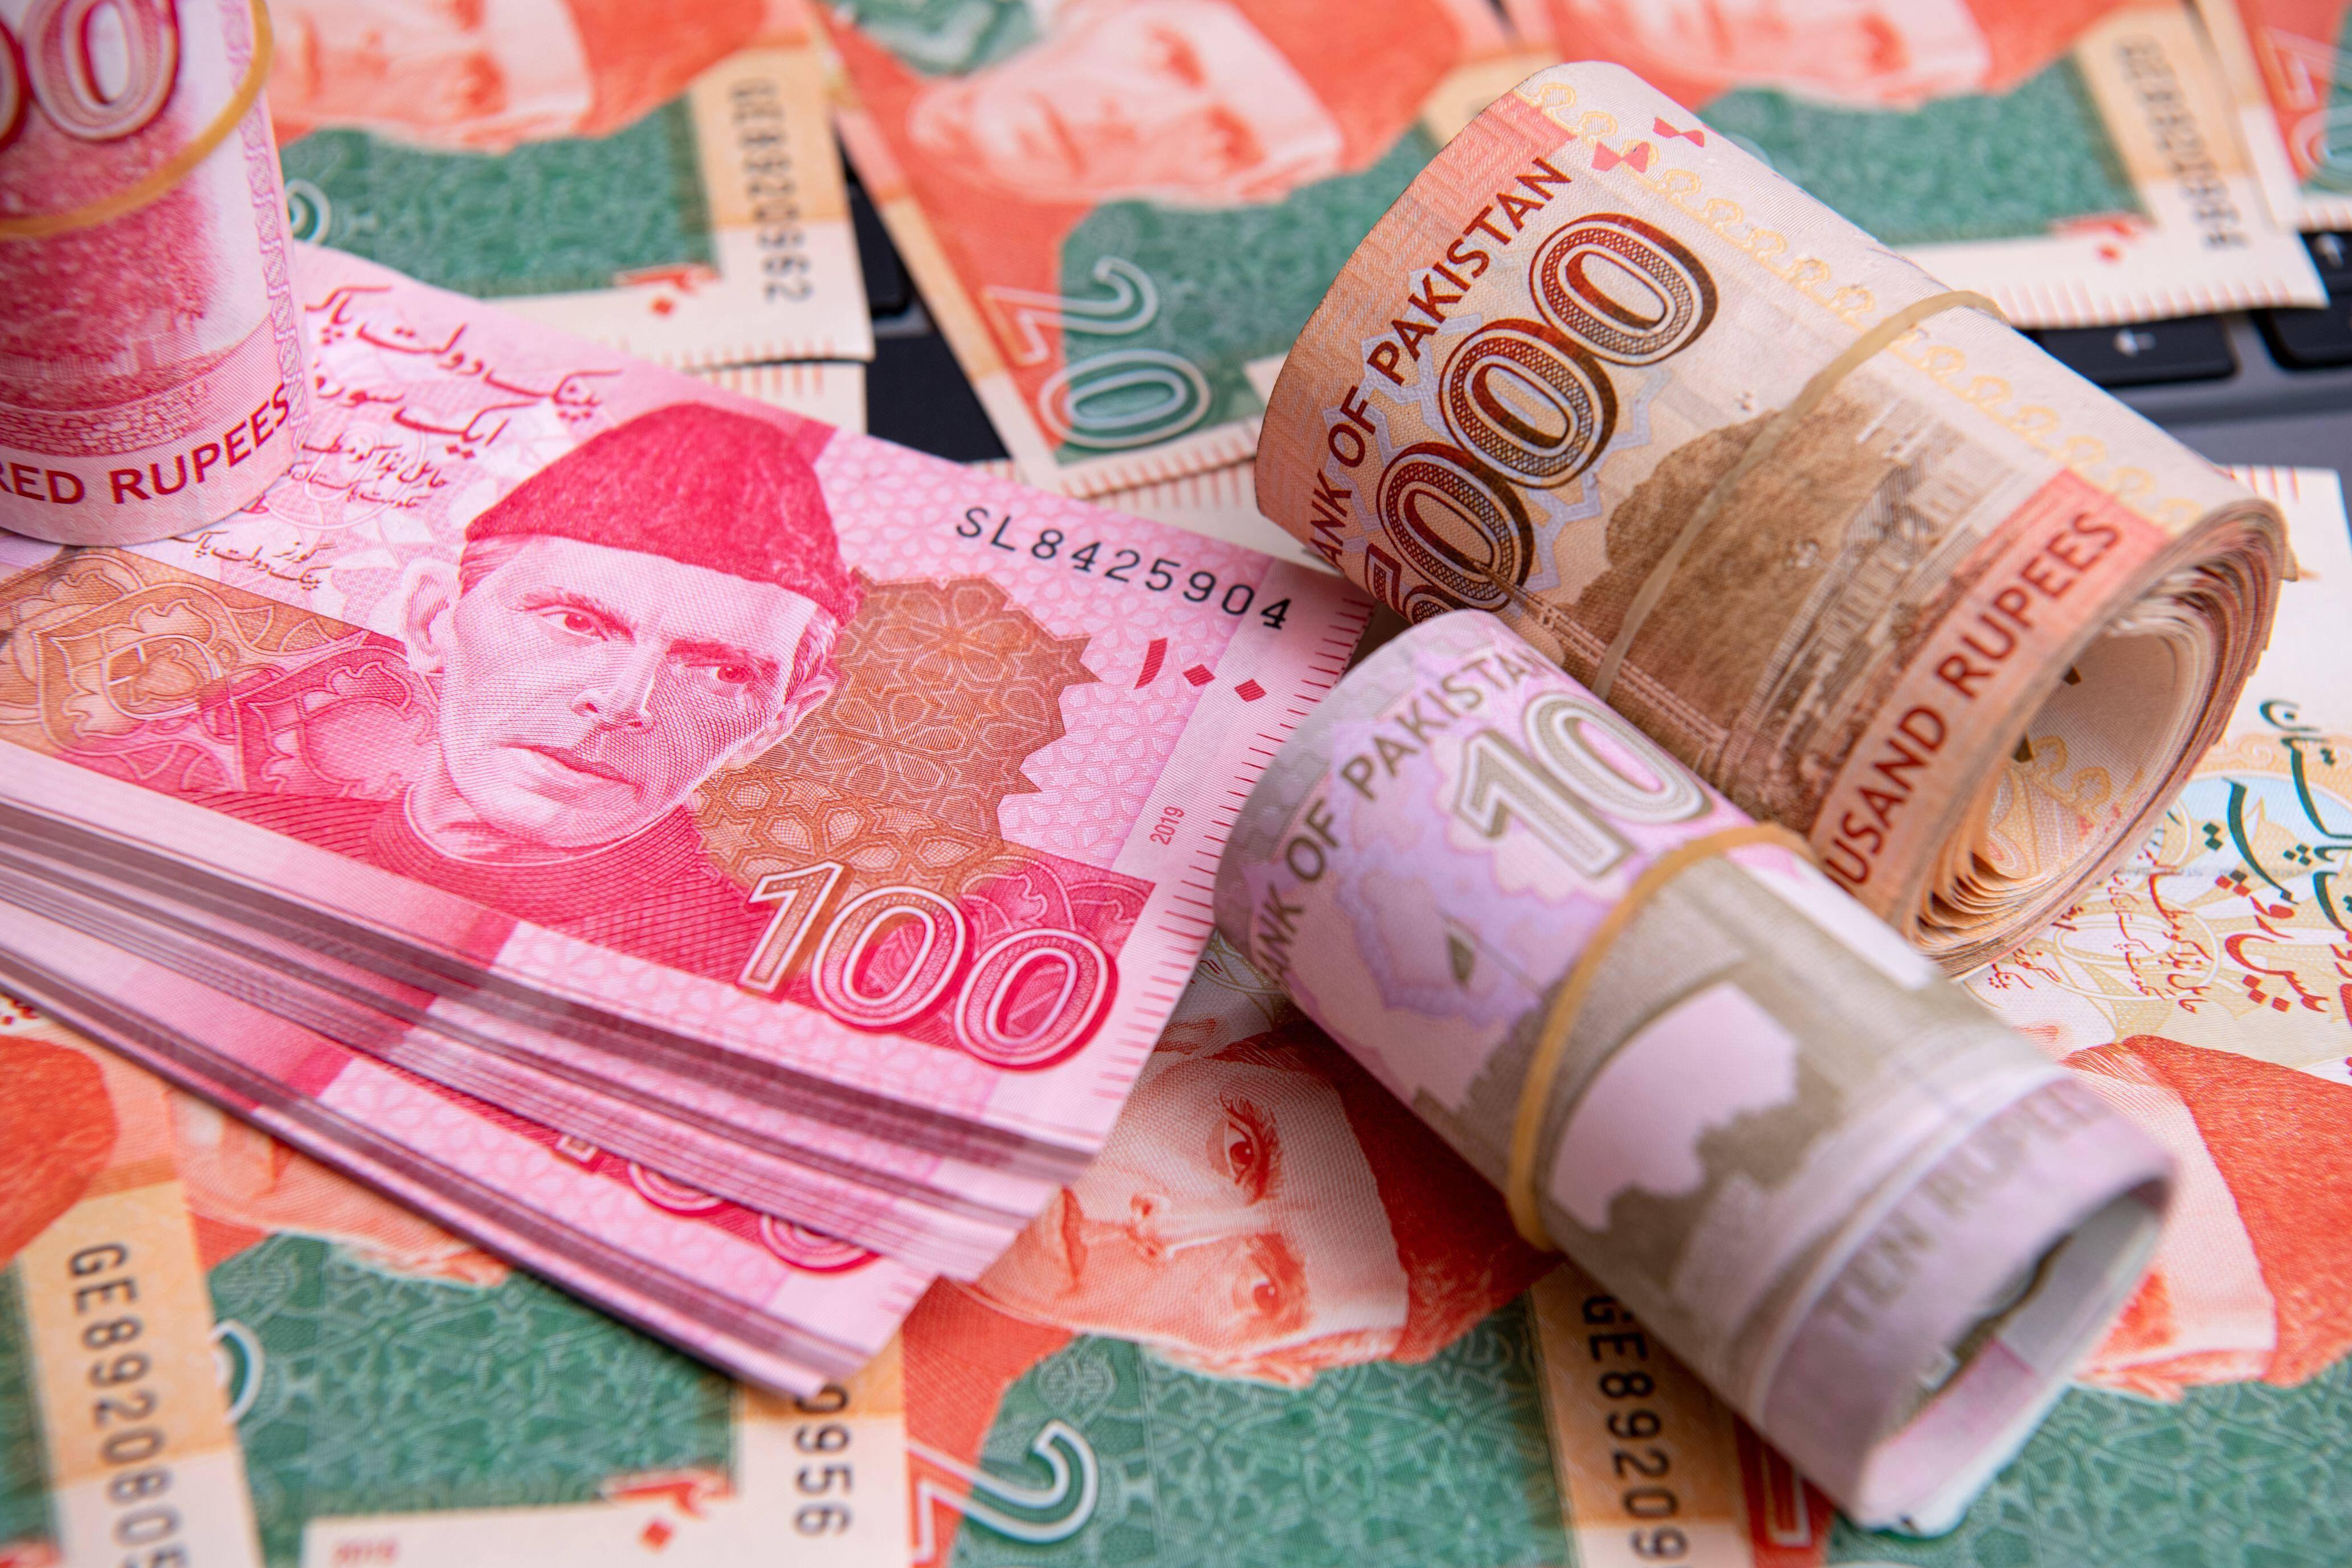 Pakistani rupee resumes losing streak - News